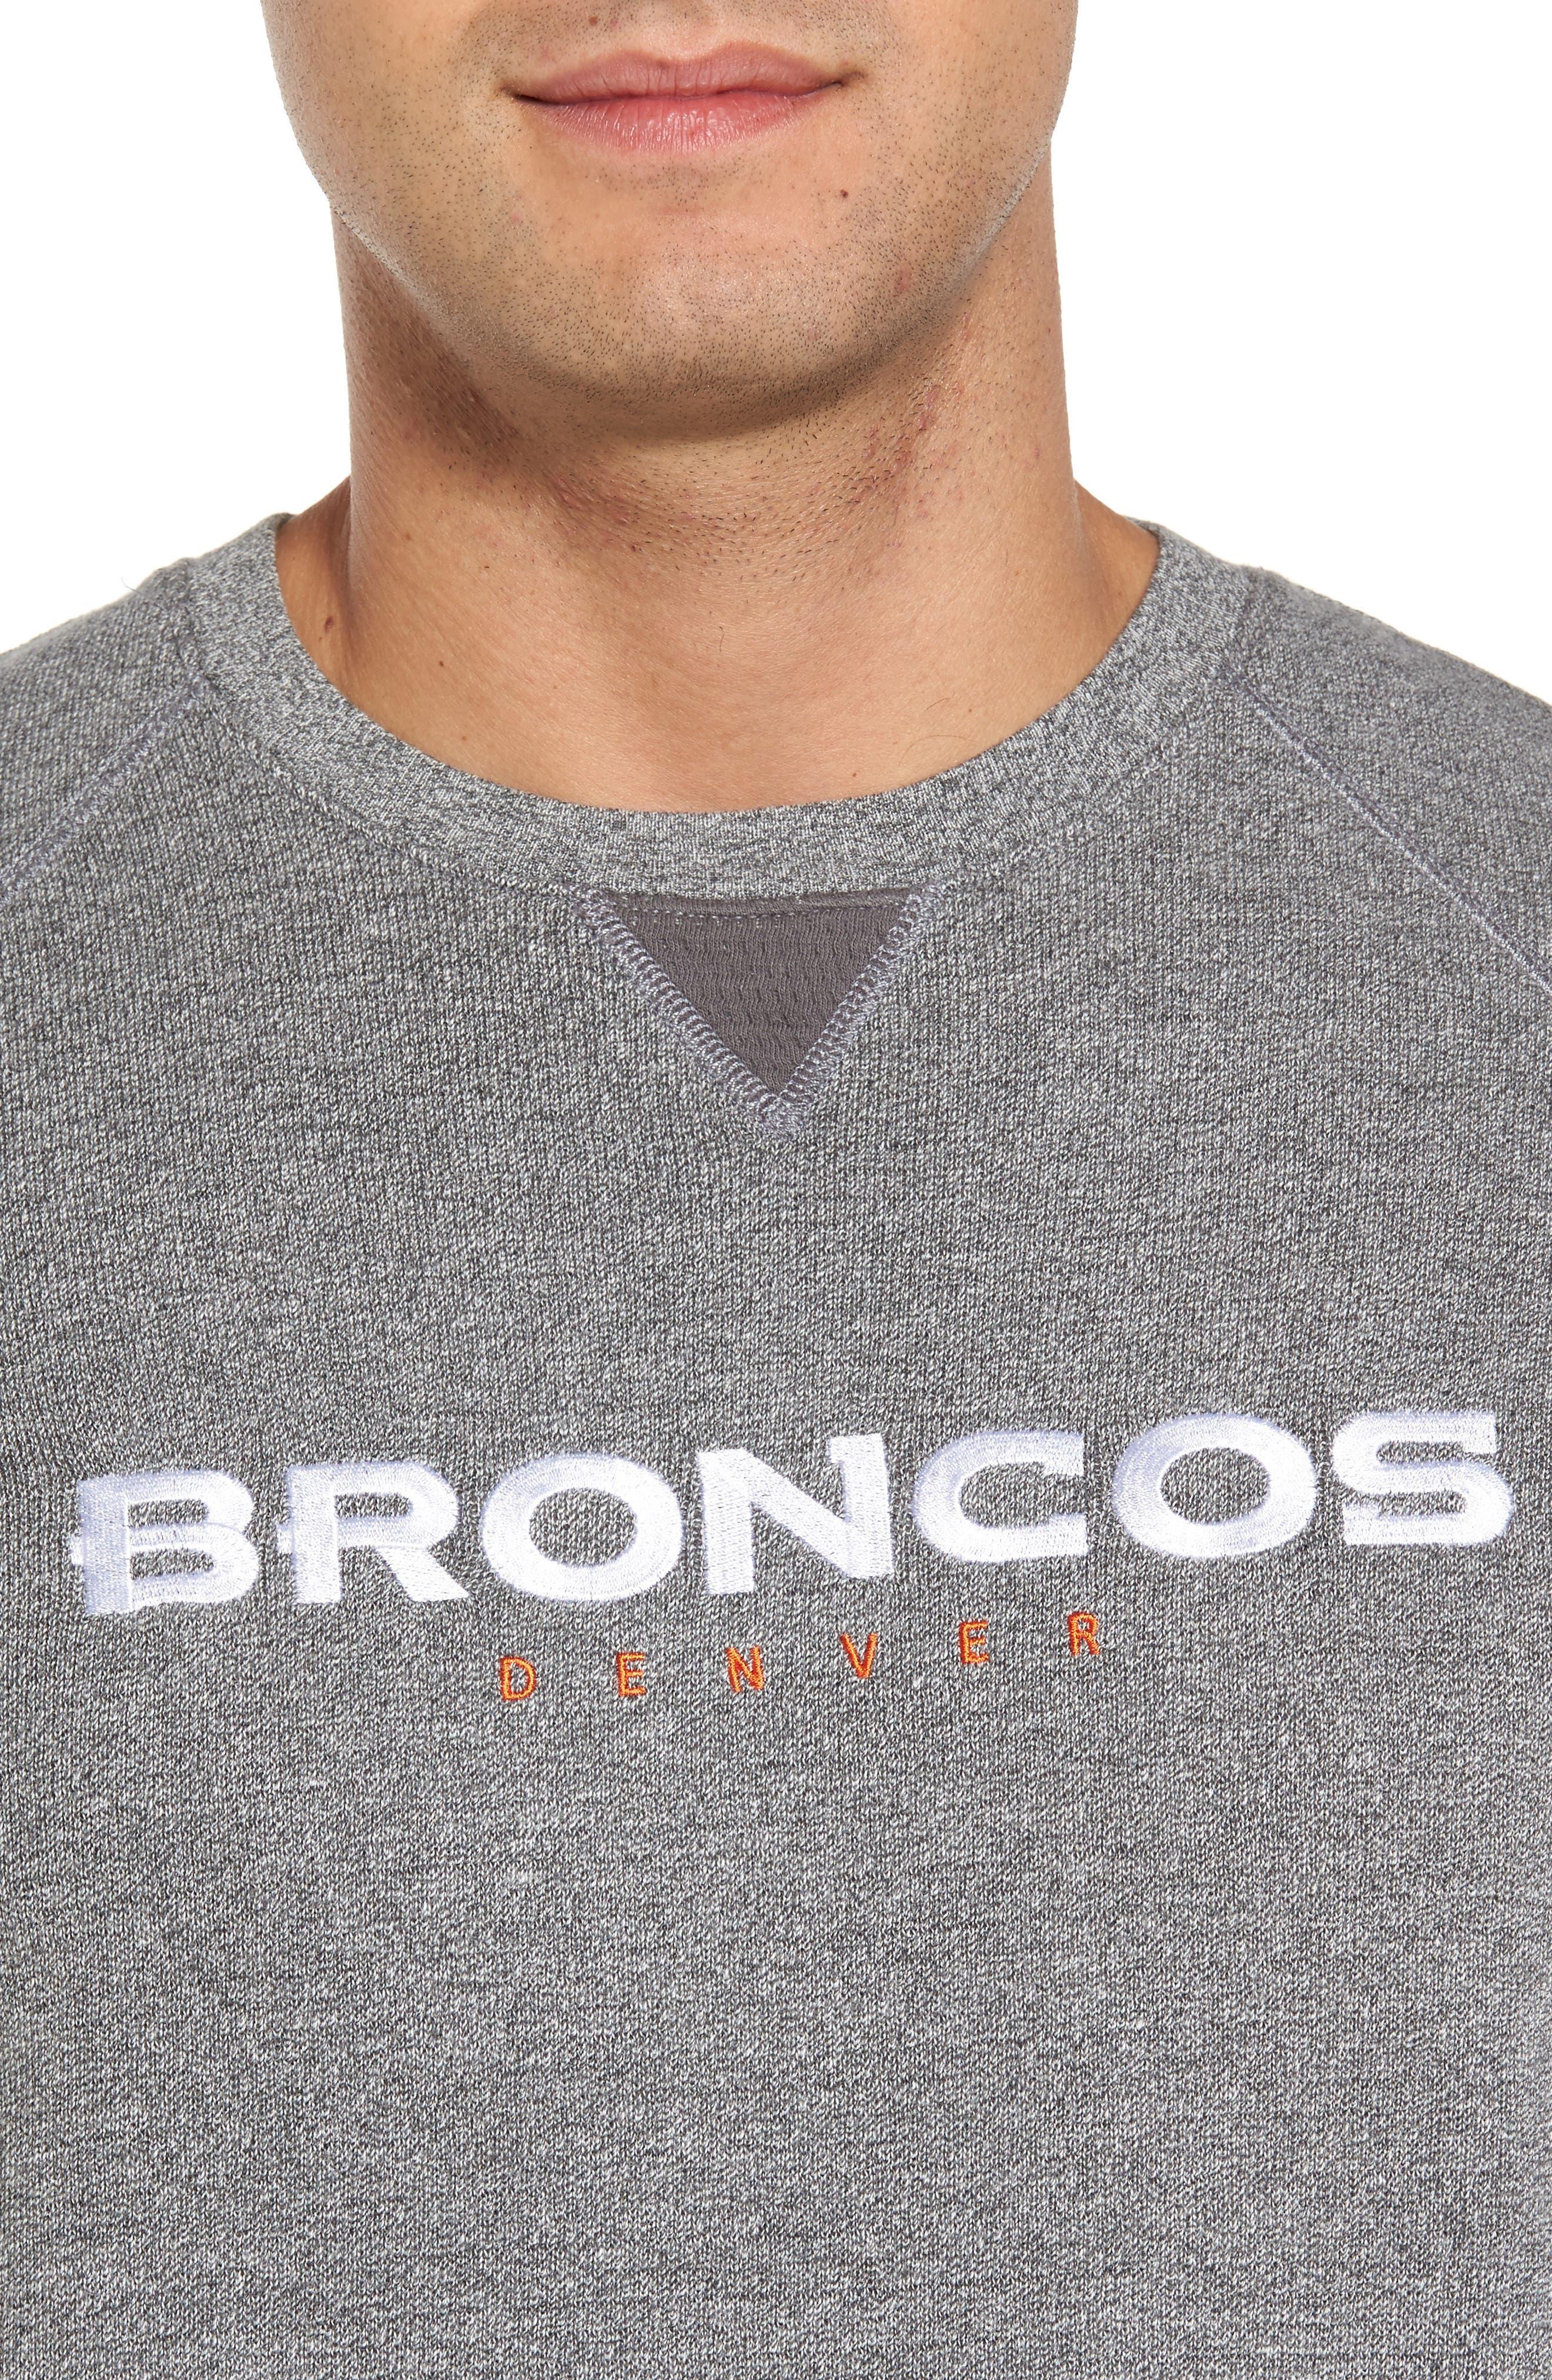 NFL Stitch of Liberty Embroidered Crewneck Sweatshirt,                             Alternate thumbnail 98, color,